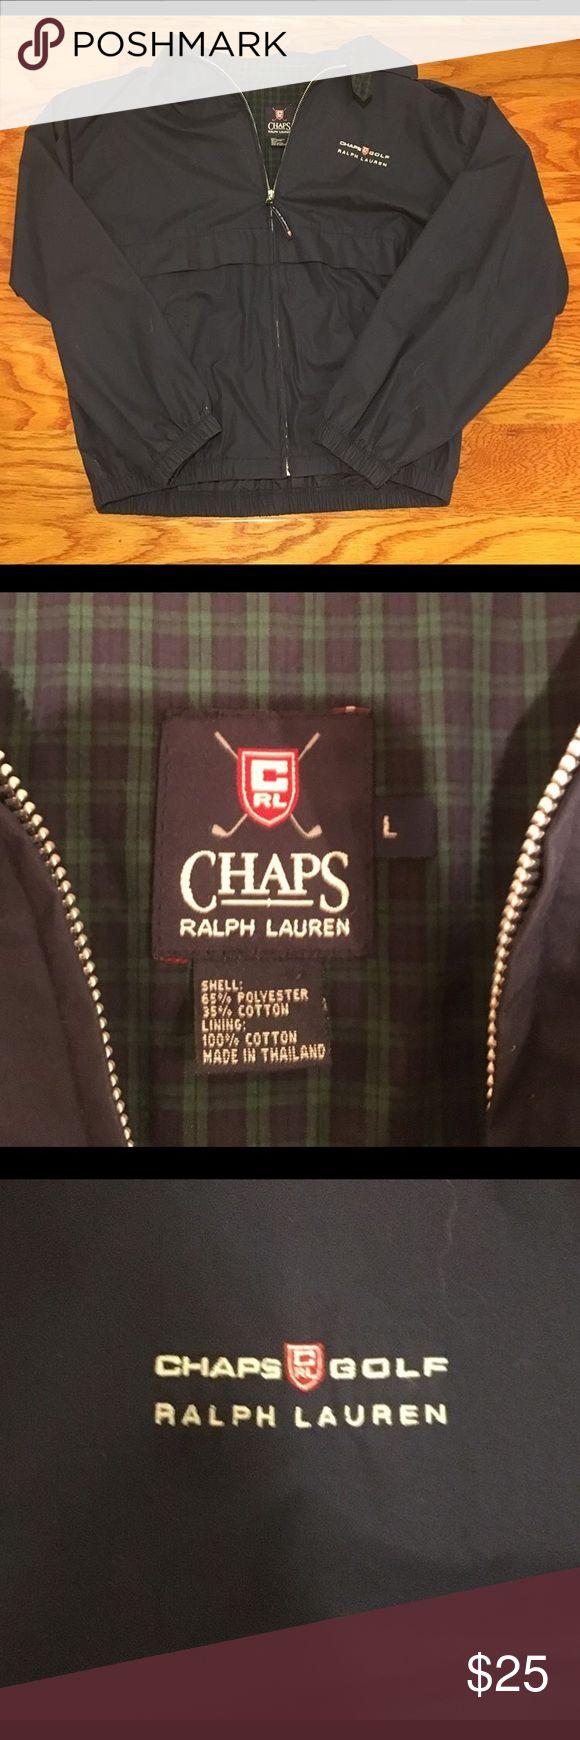 Vintage Chaps Ralph Lauren Golf Jacket Great Condition 8/10 Chaps Jackets & Coats Lightweight & Shirt Jackets